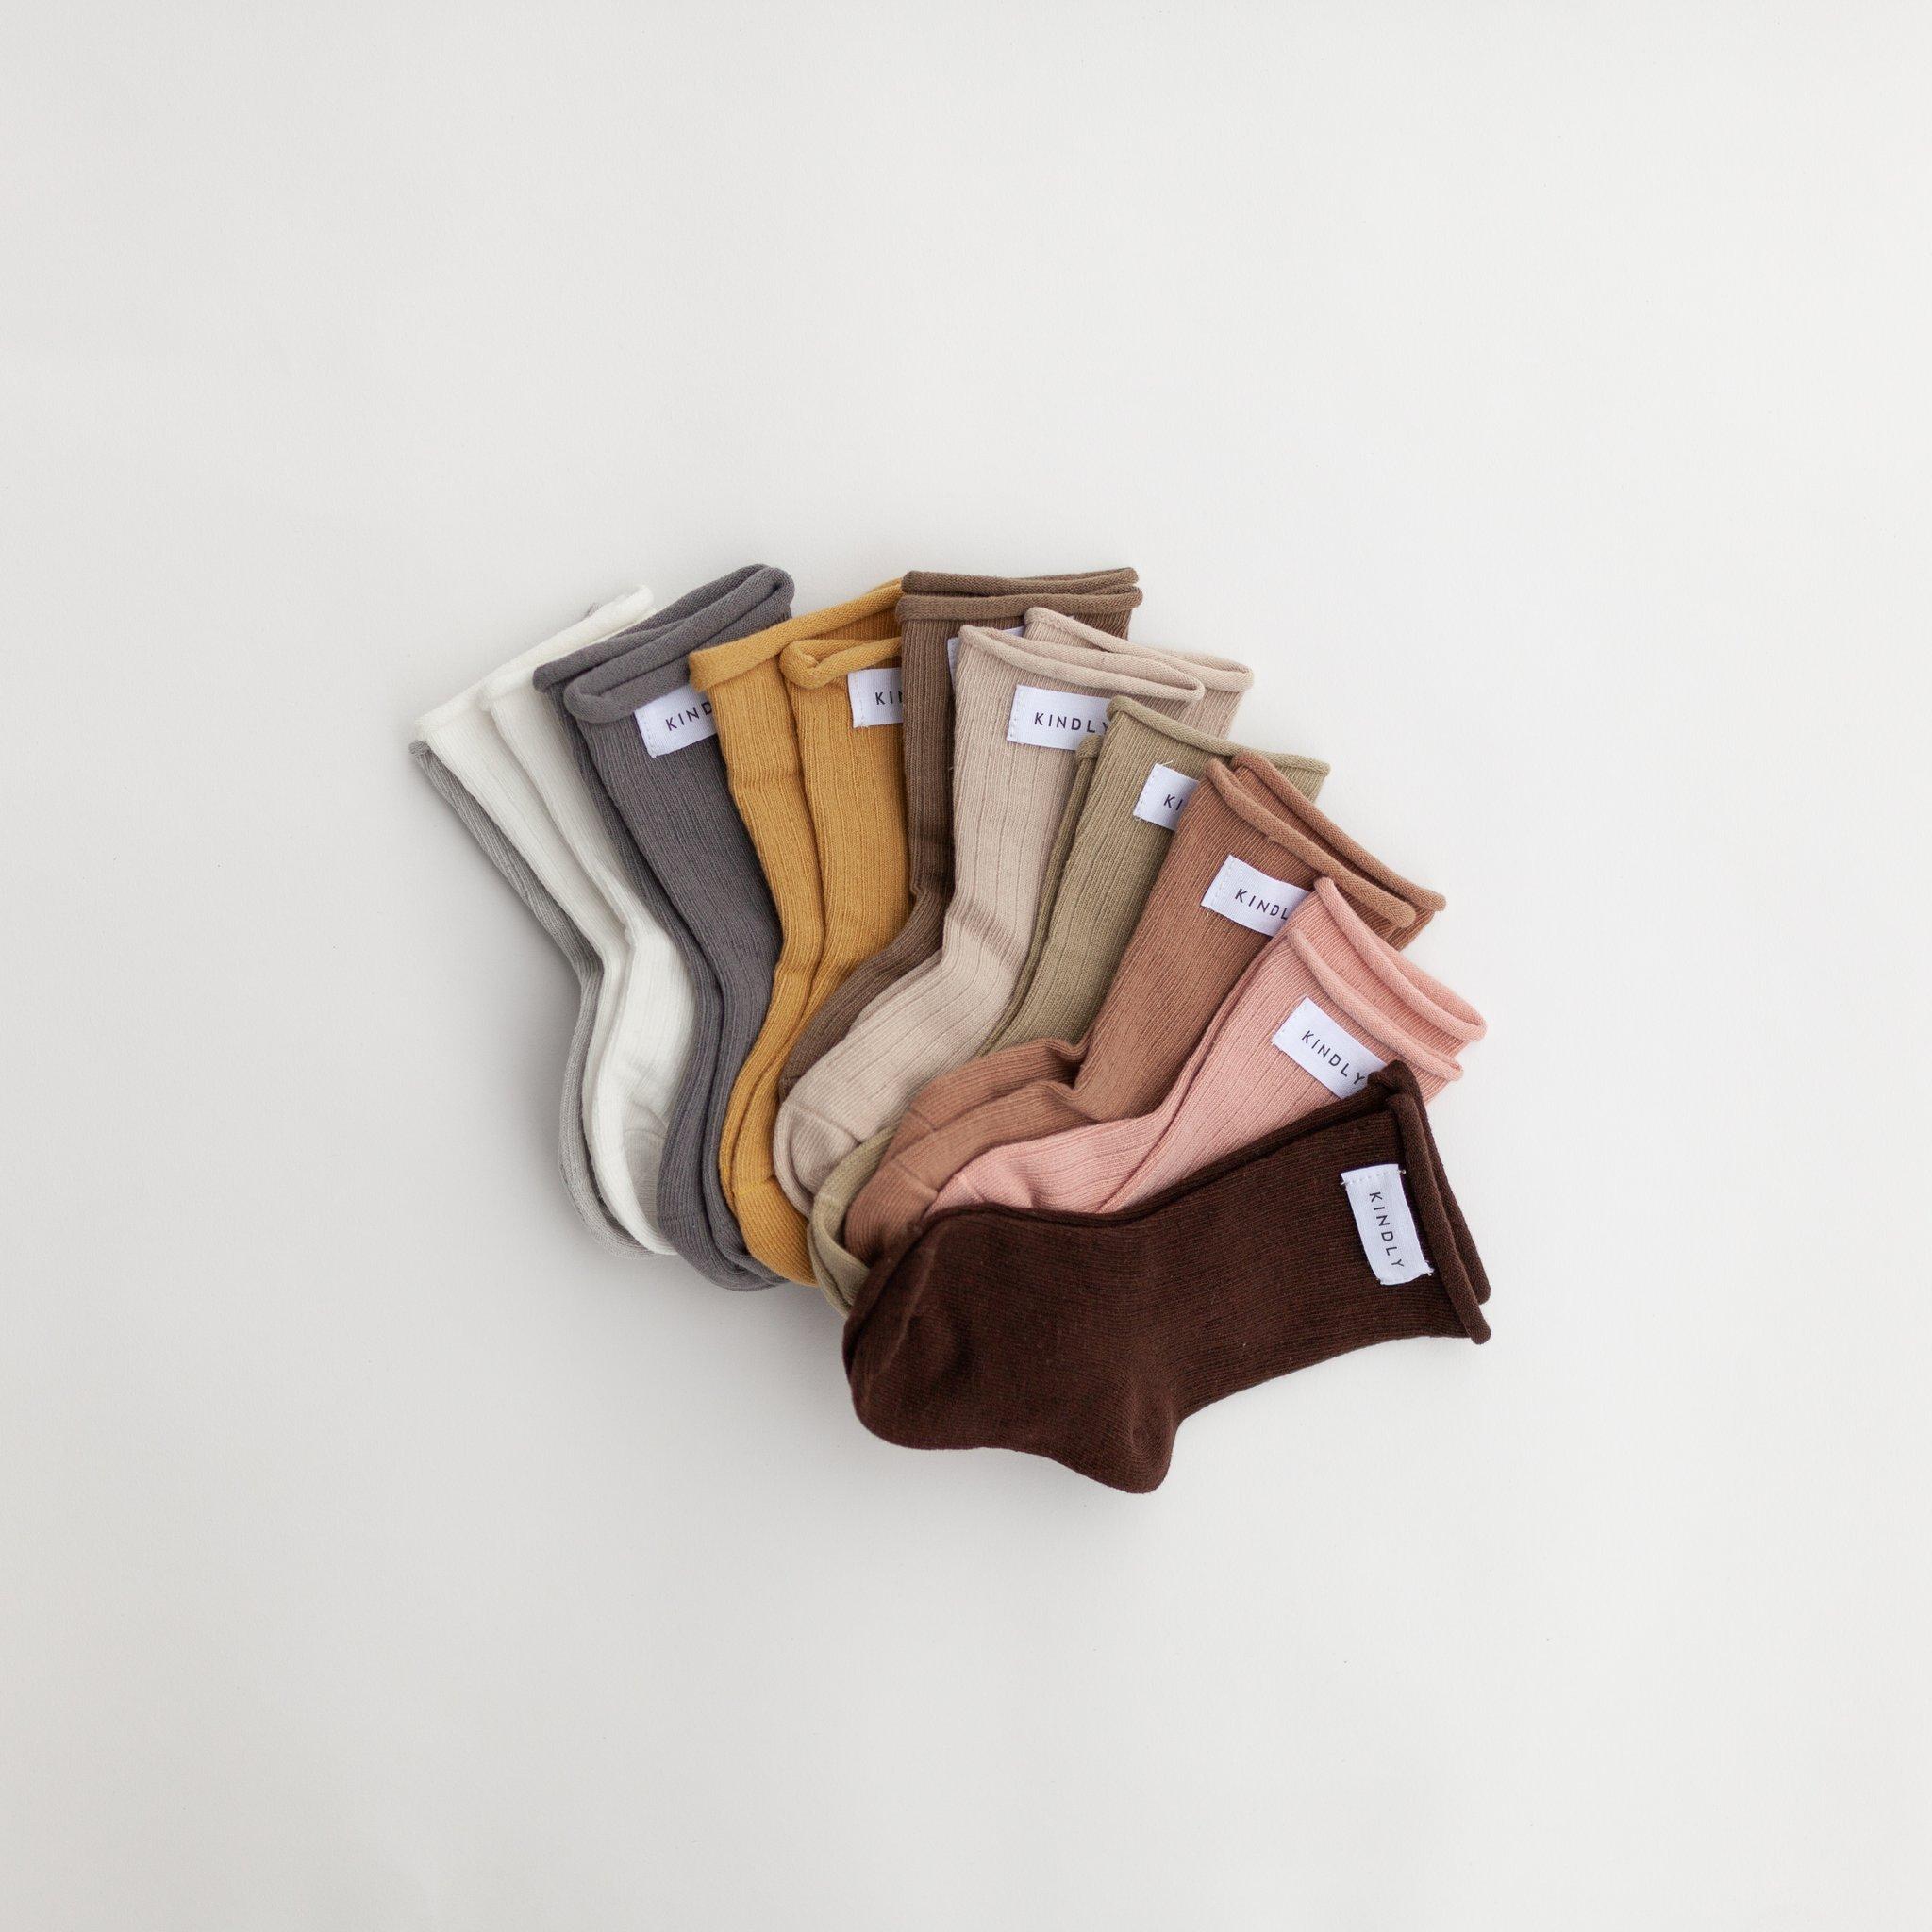 KINDLY (Tidligere Fireldday) Socks - 7 farger -